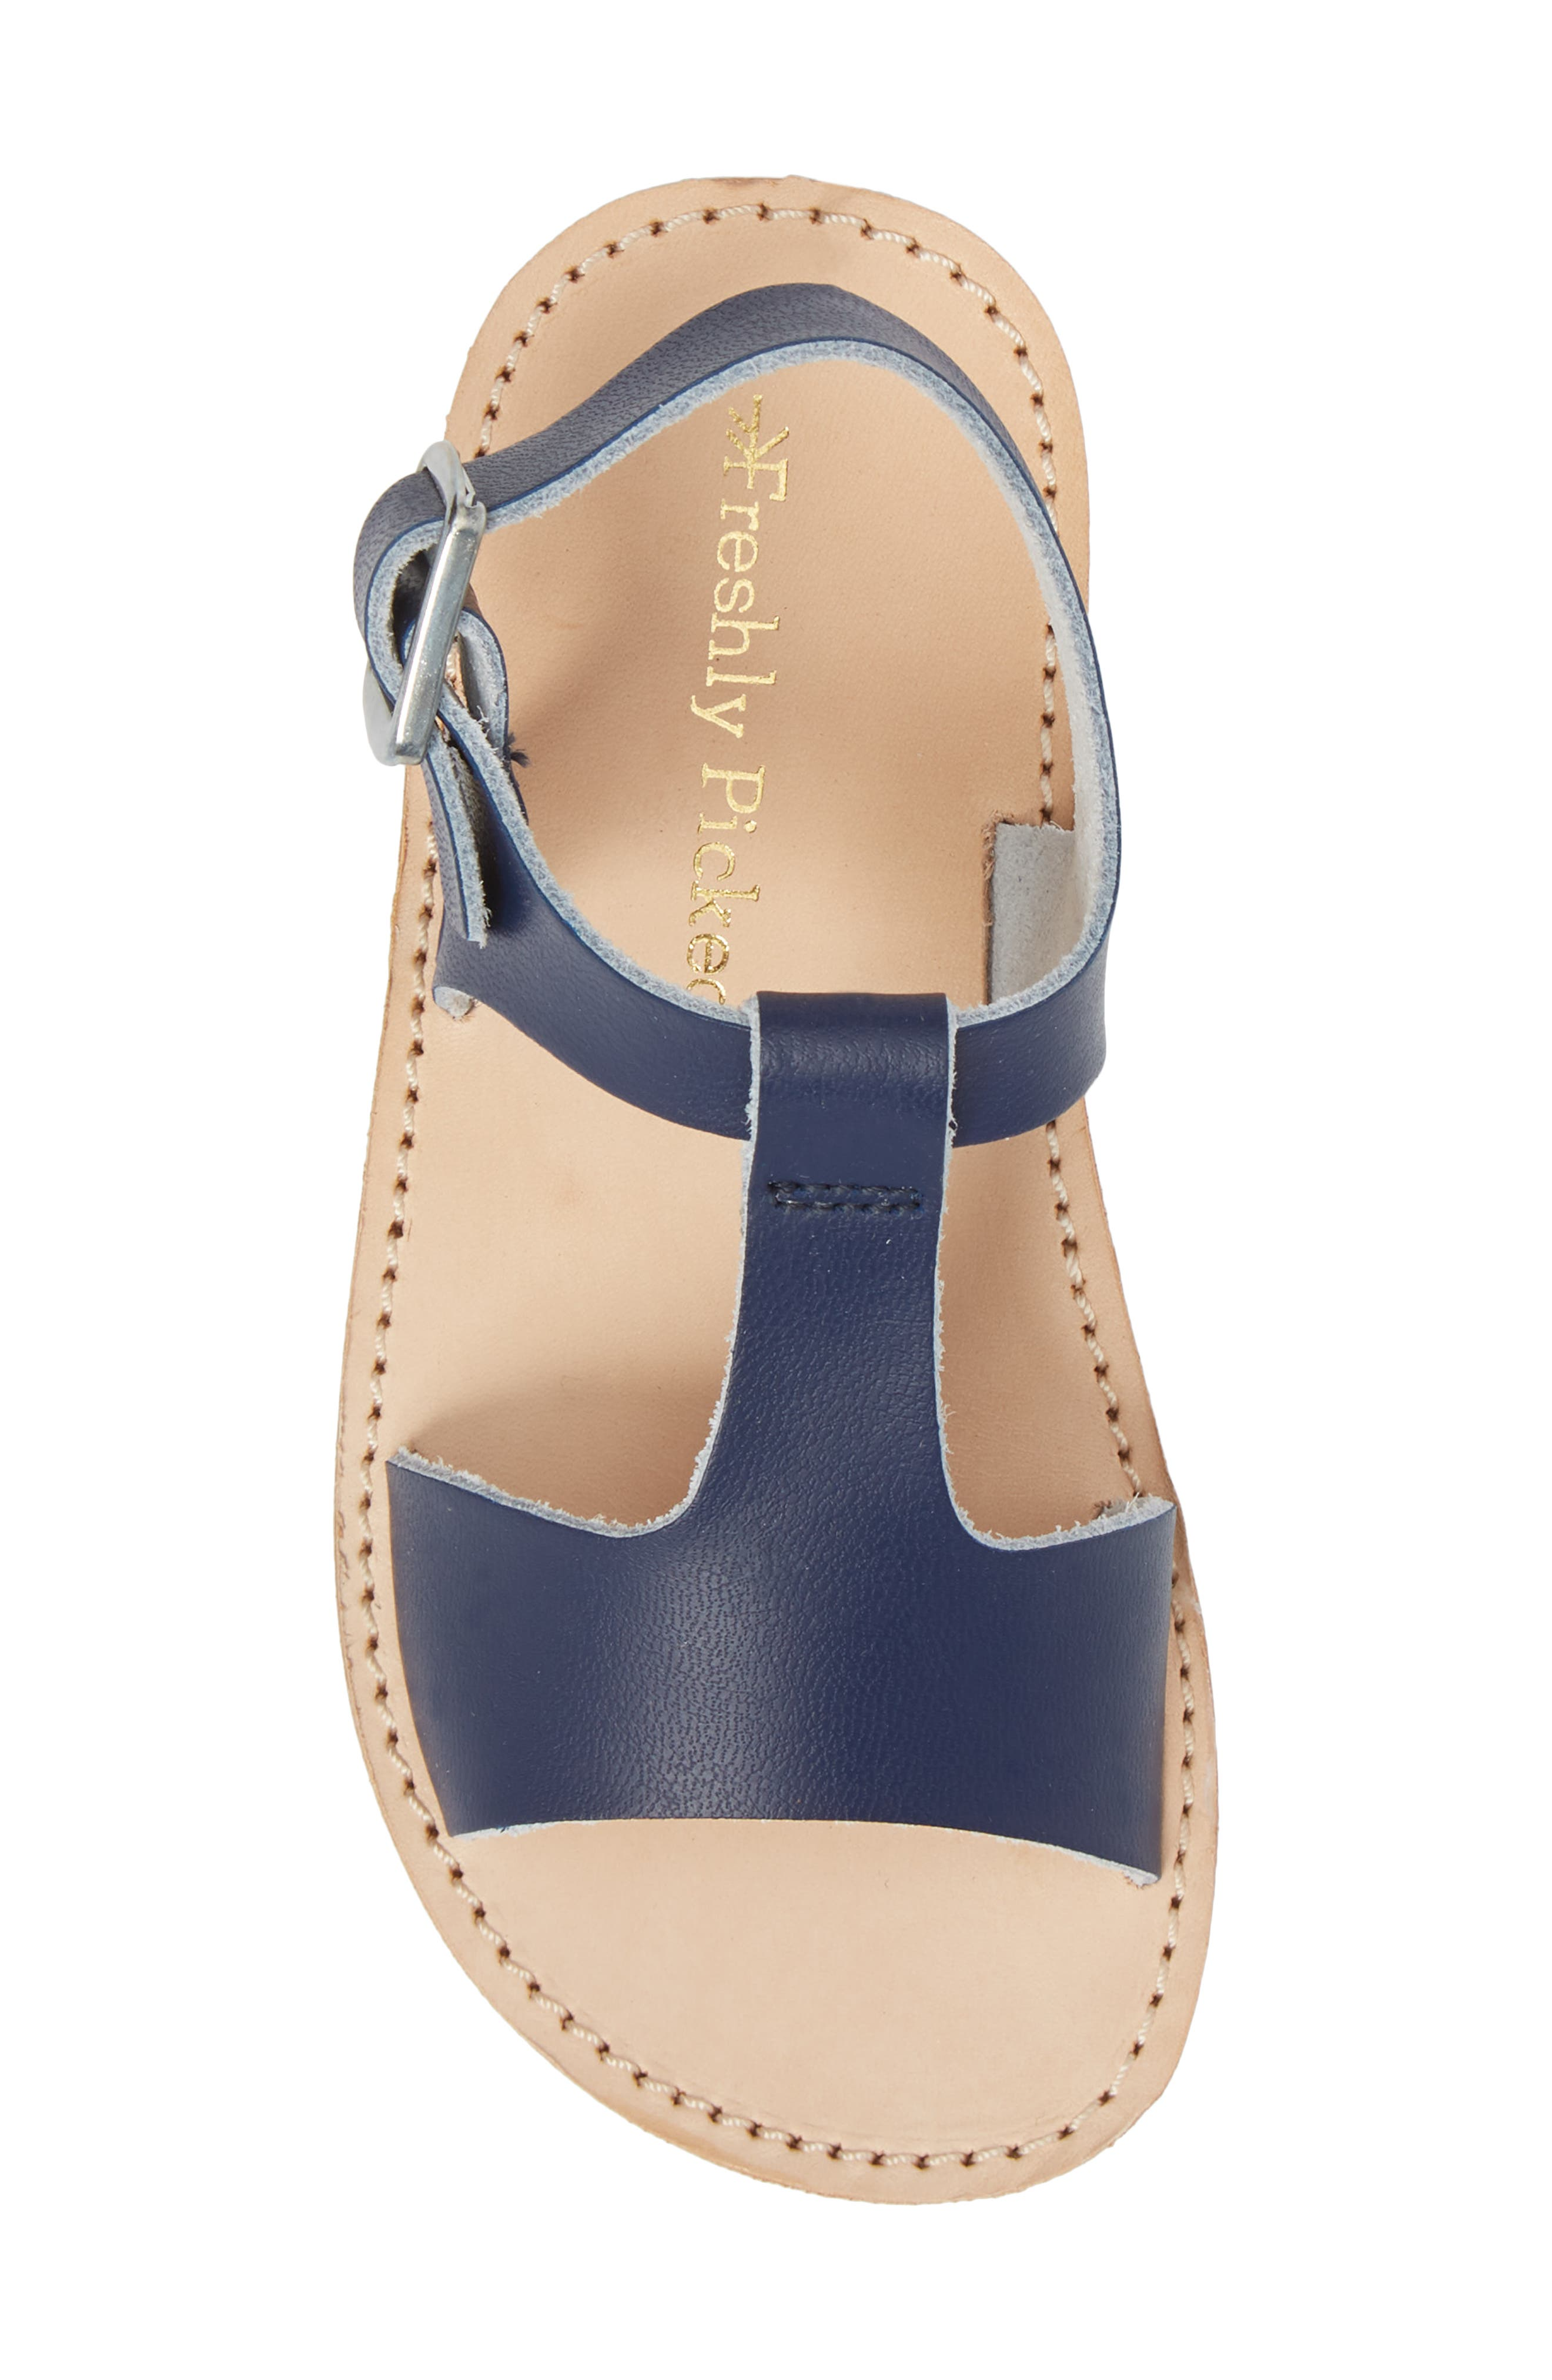 Malibu Water Resistant Sandal,                             Alternate thumbnail 5, color,                             Navy